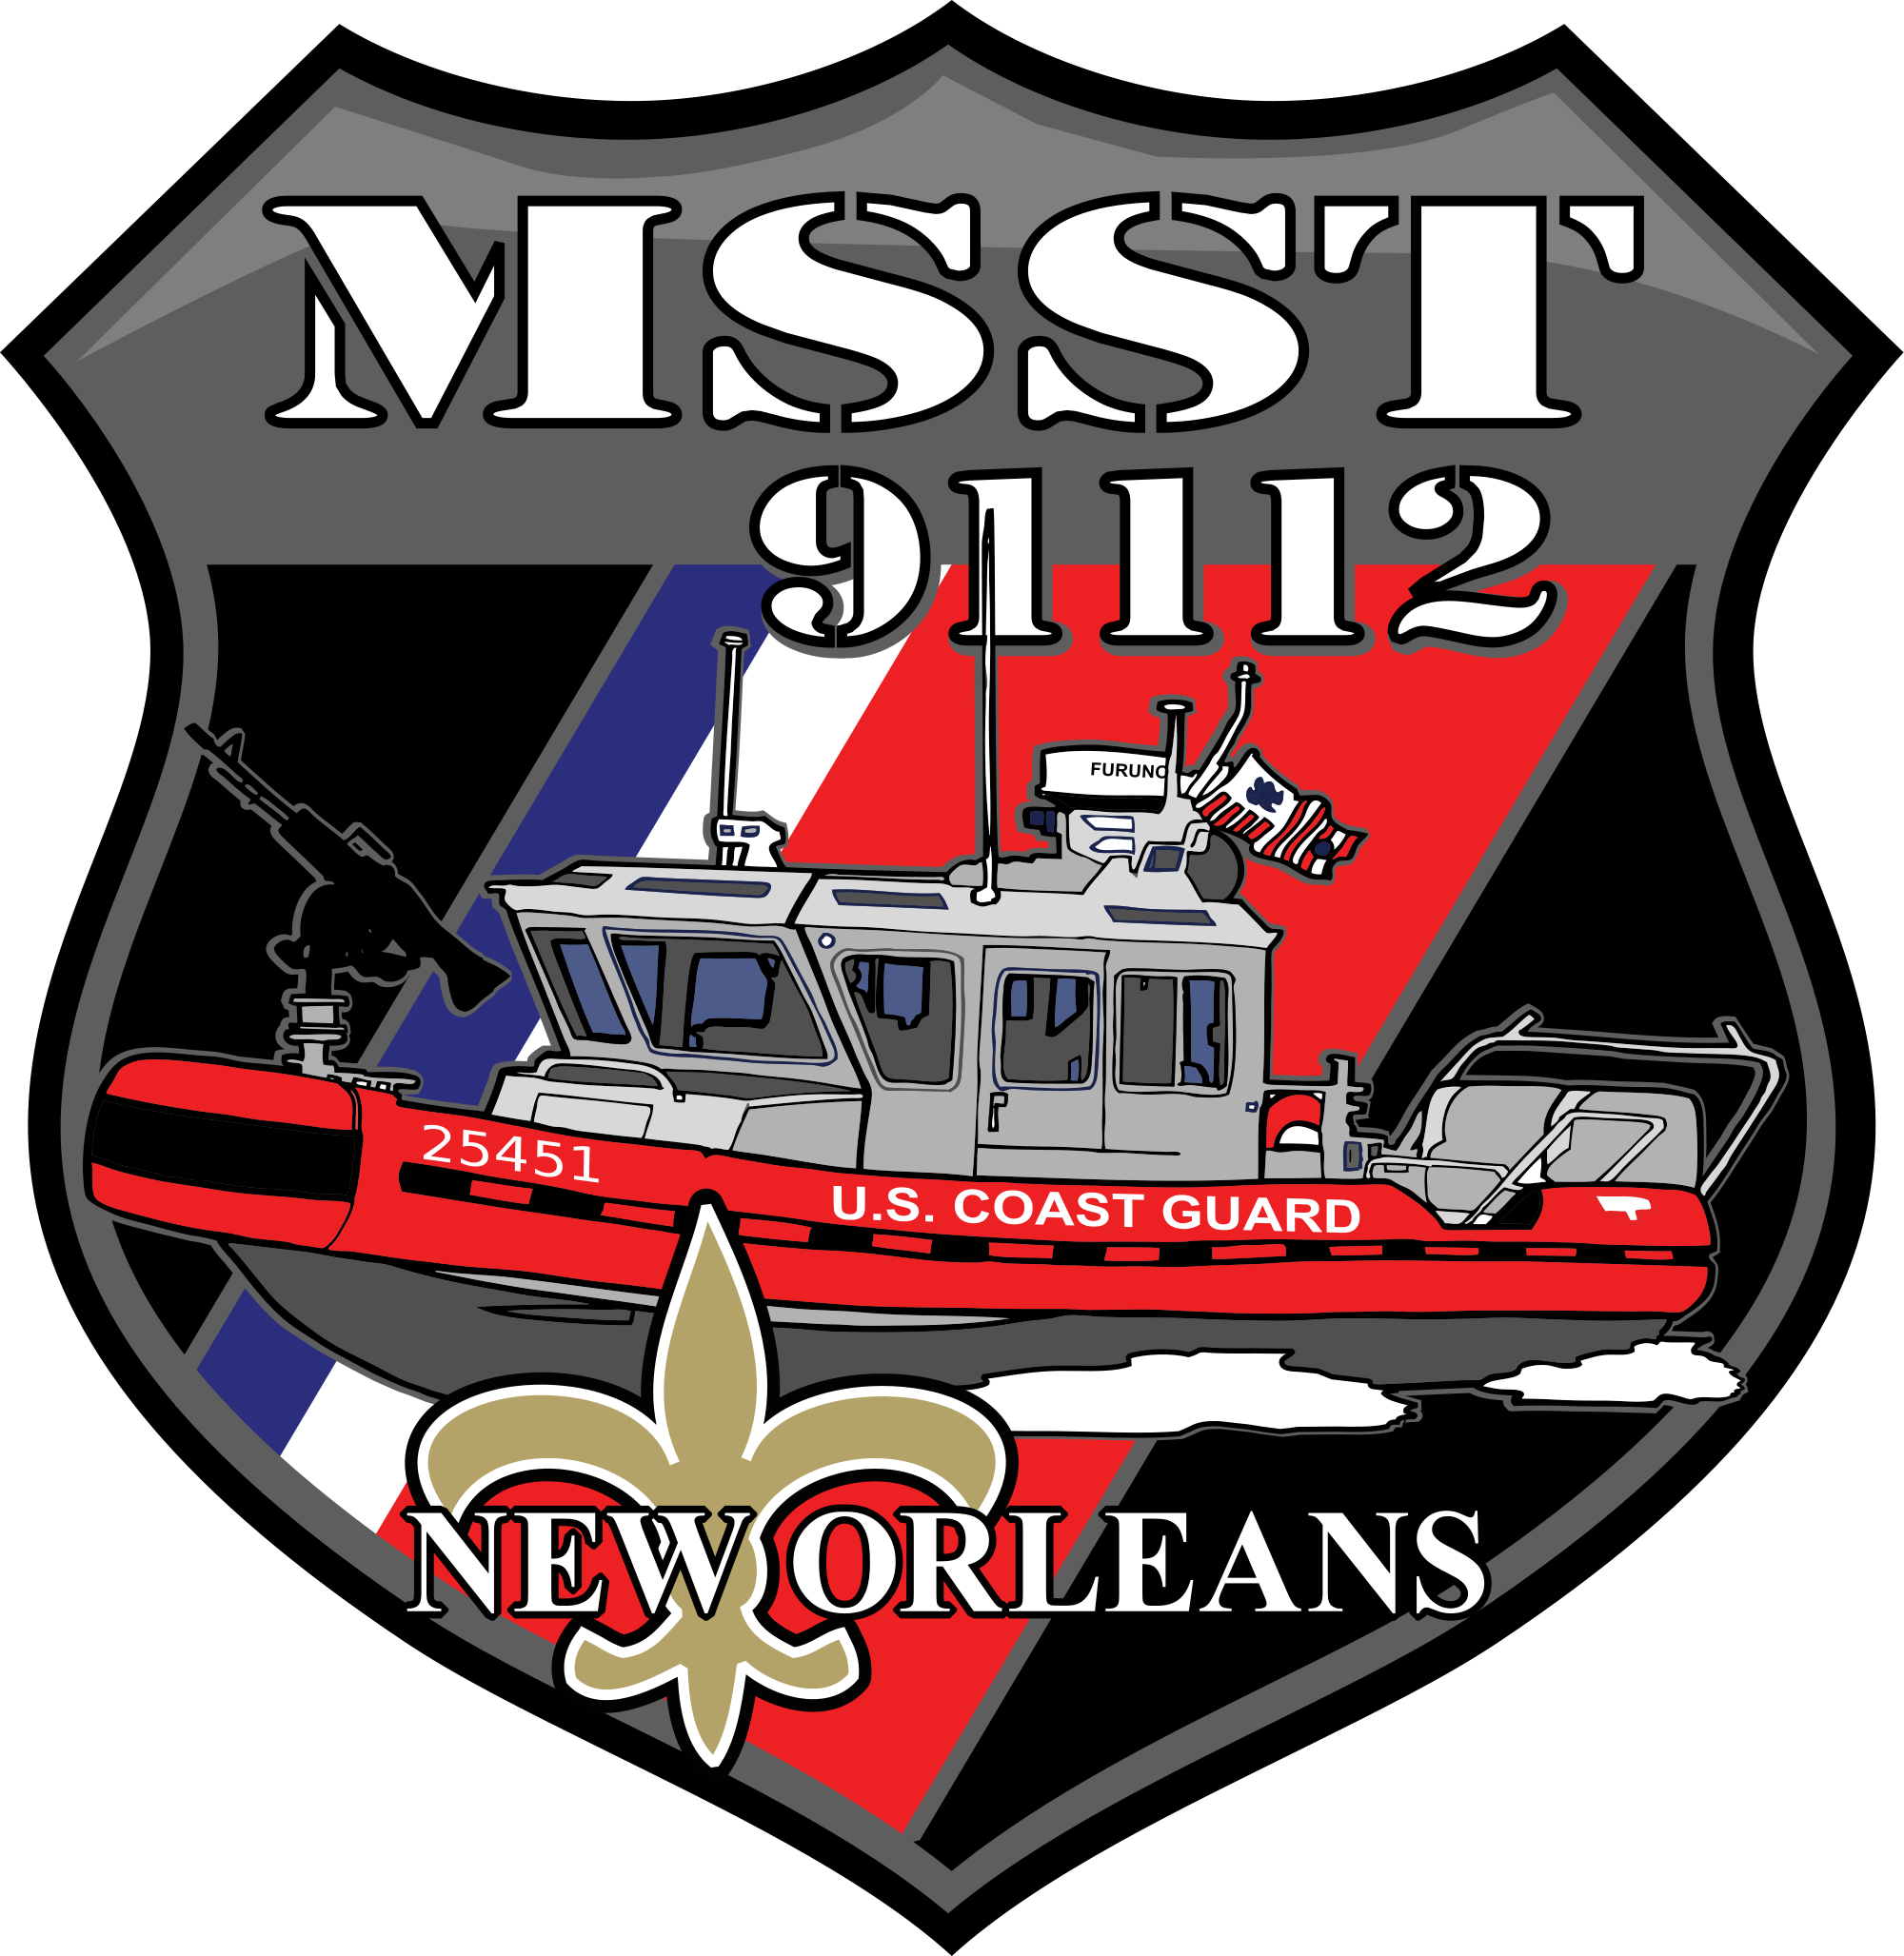 United states new orleans. Sailor clipart uniform coast guard